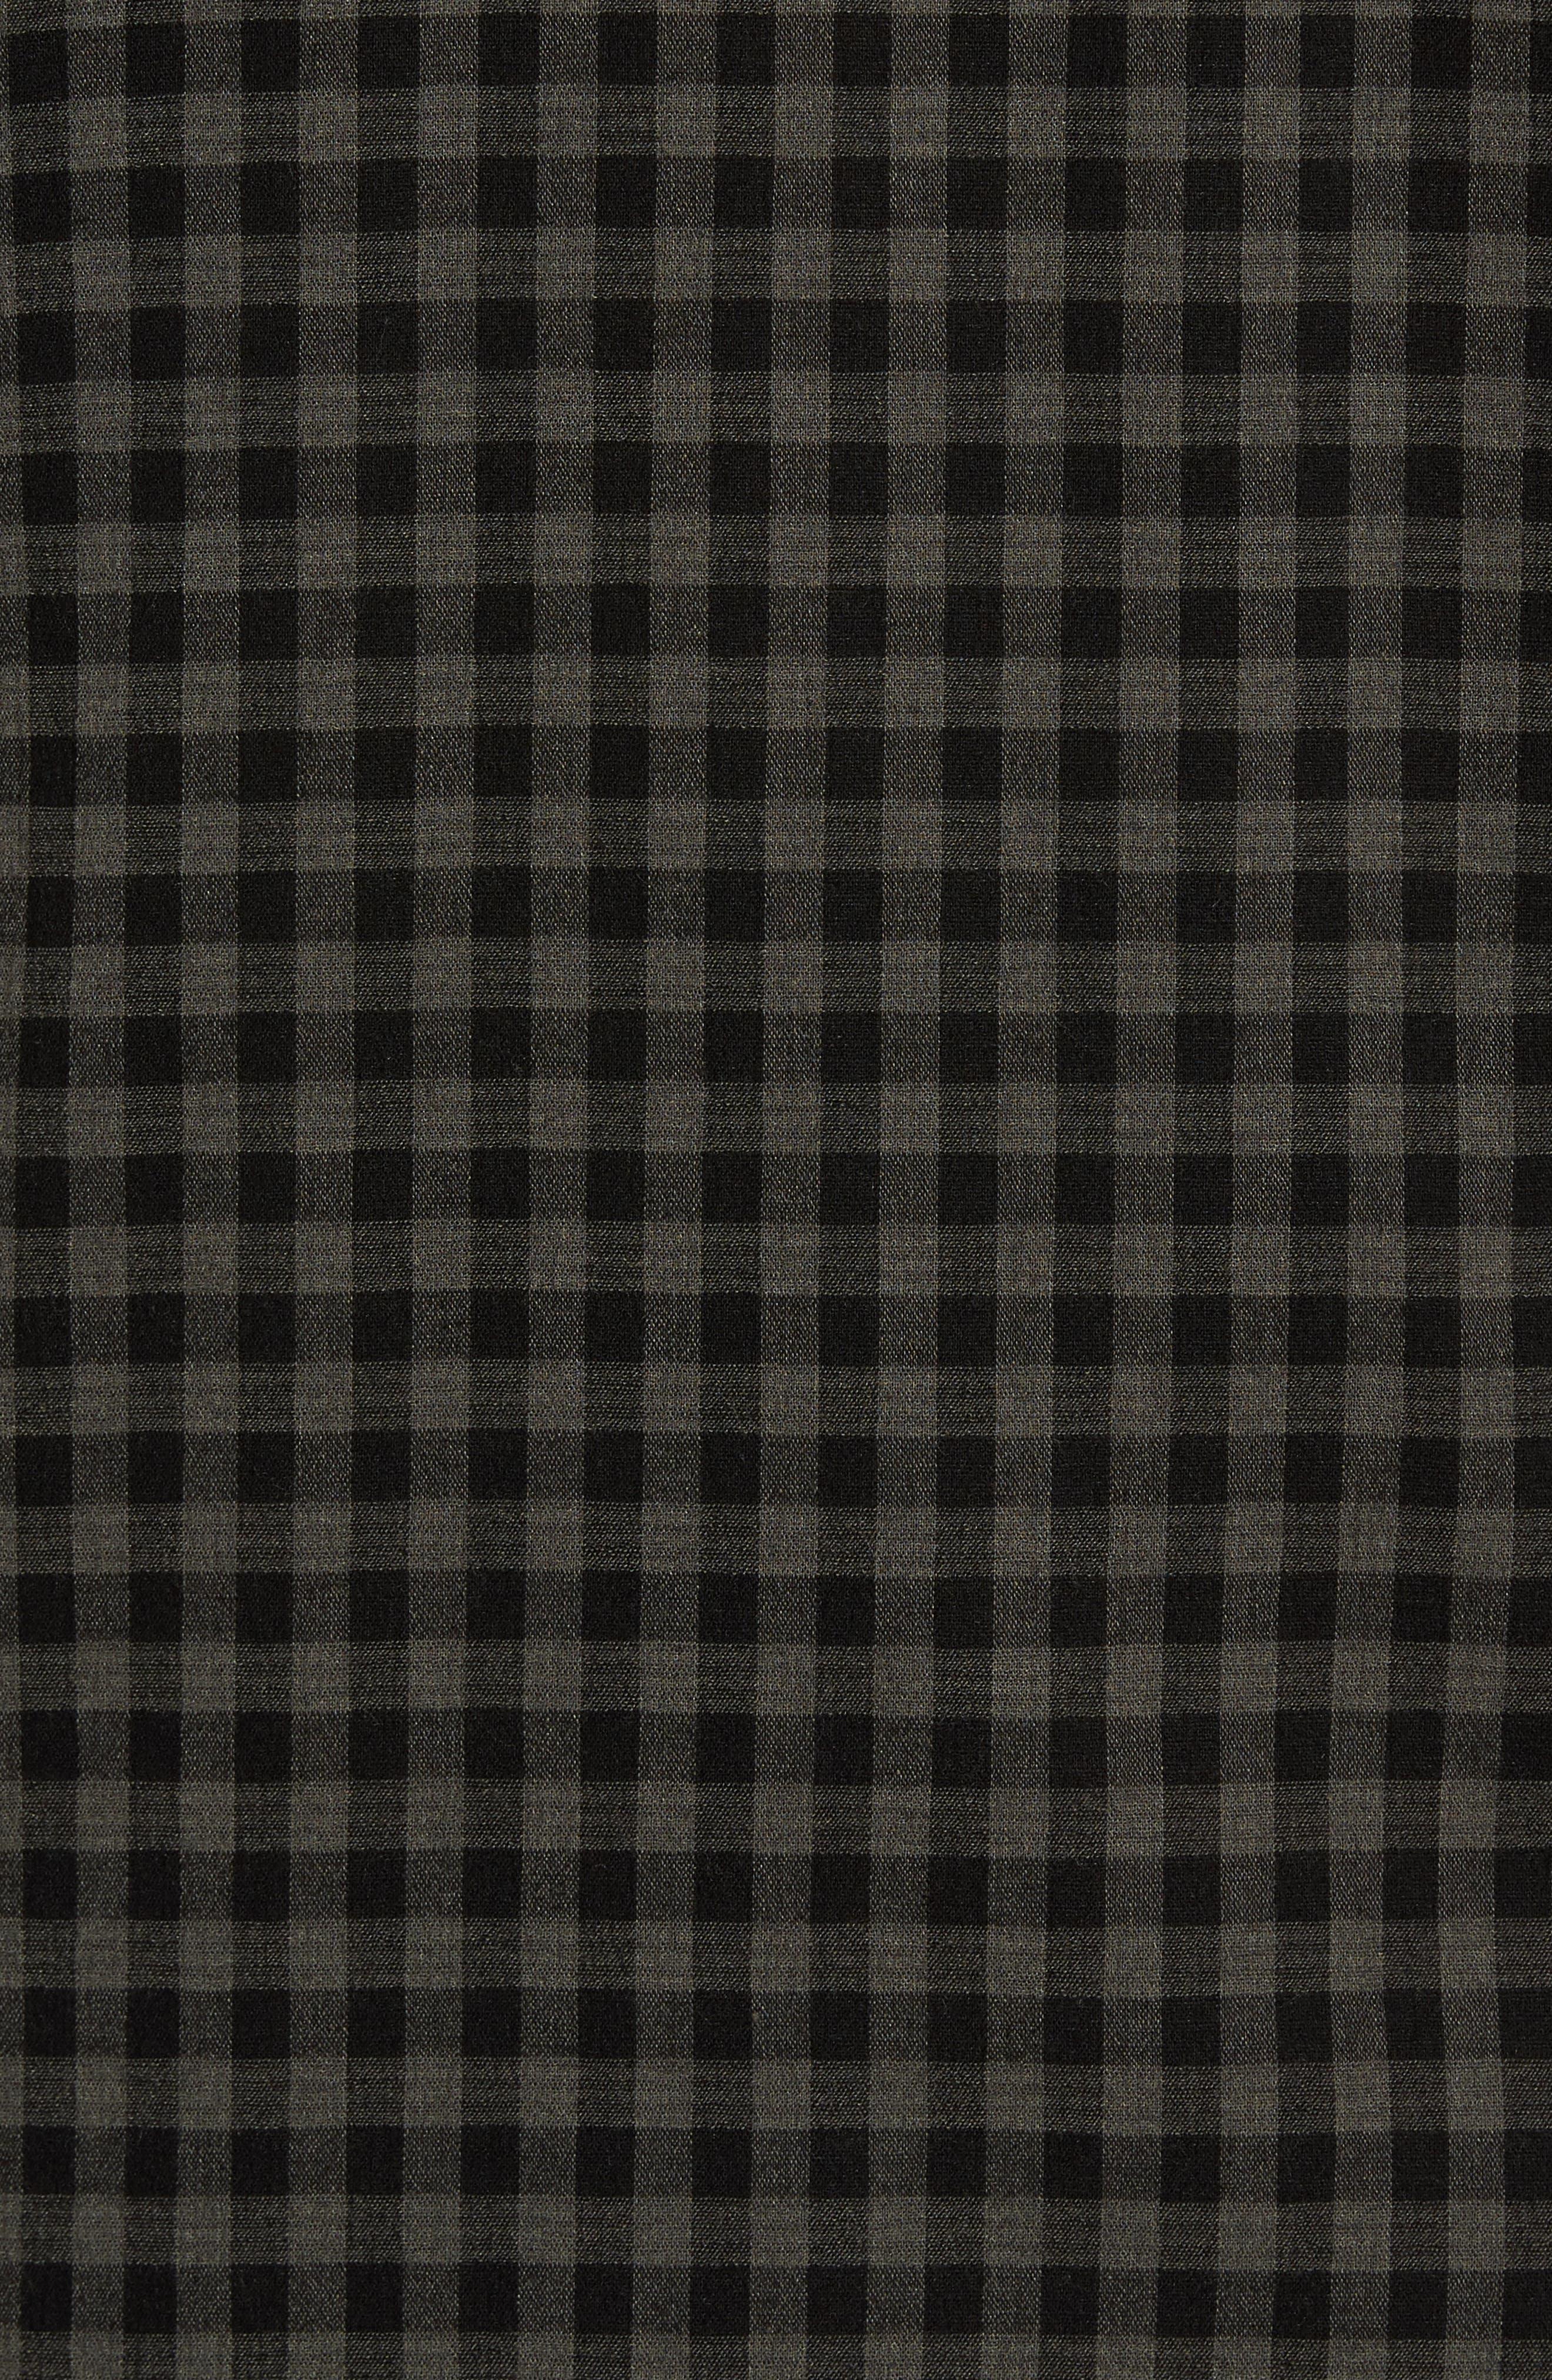 Gingham Check Blouse,                             Alternate thumbnail 5, color,                             Olive/ Black Gingham